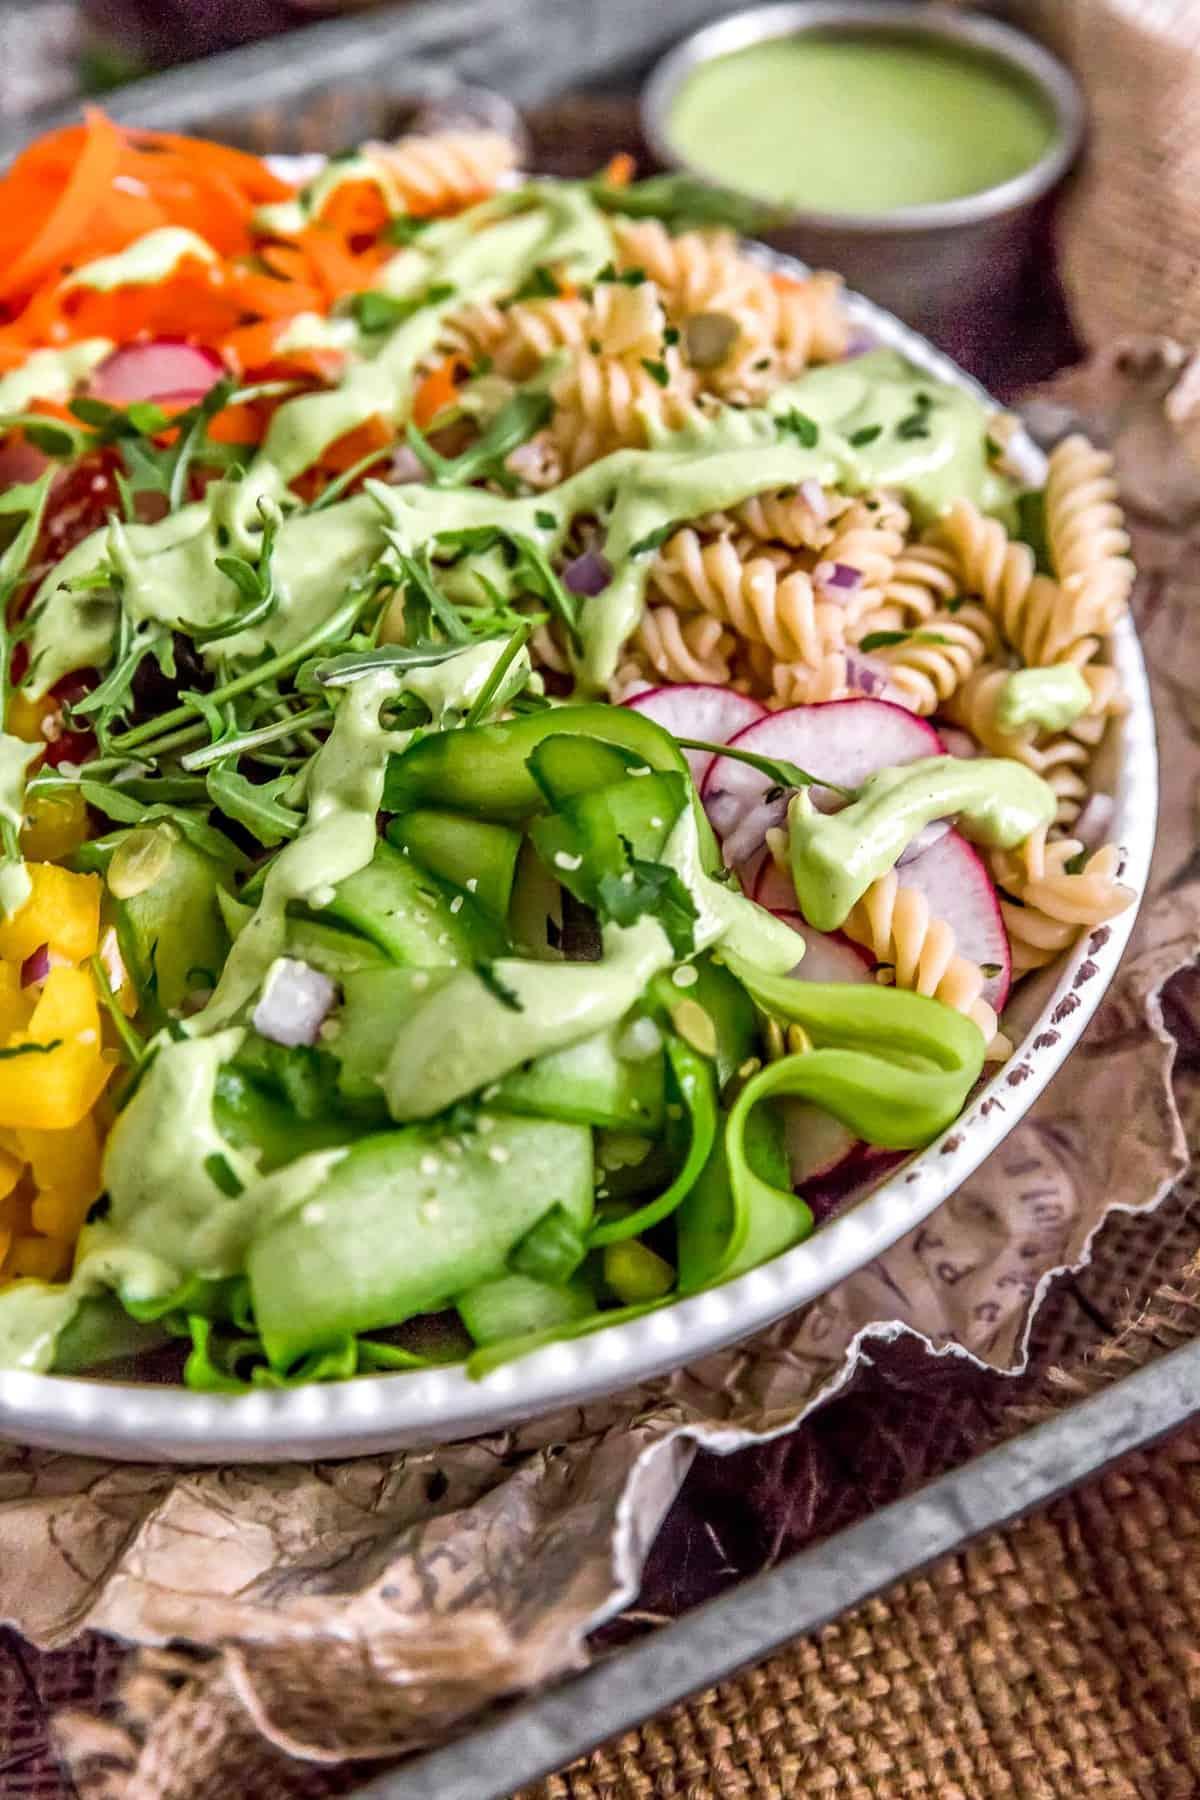 Salad with Vegan Green Goddess Dressing